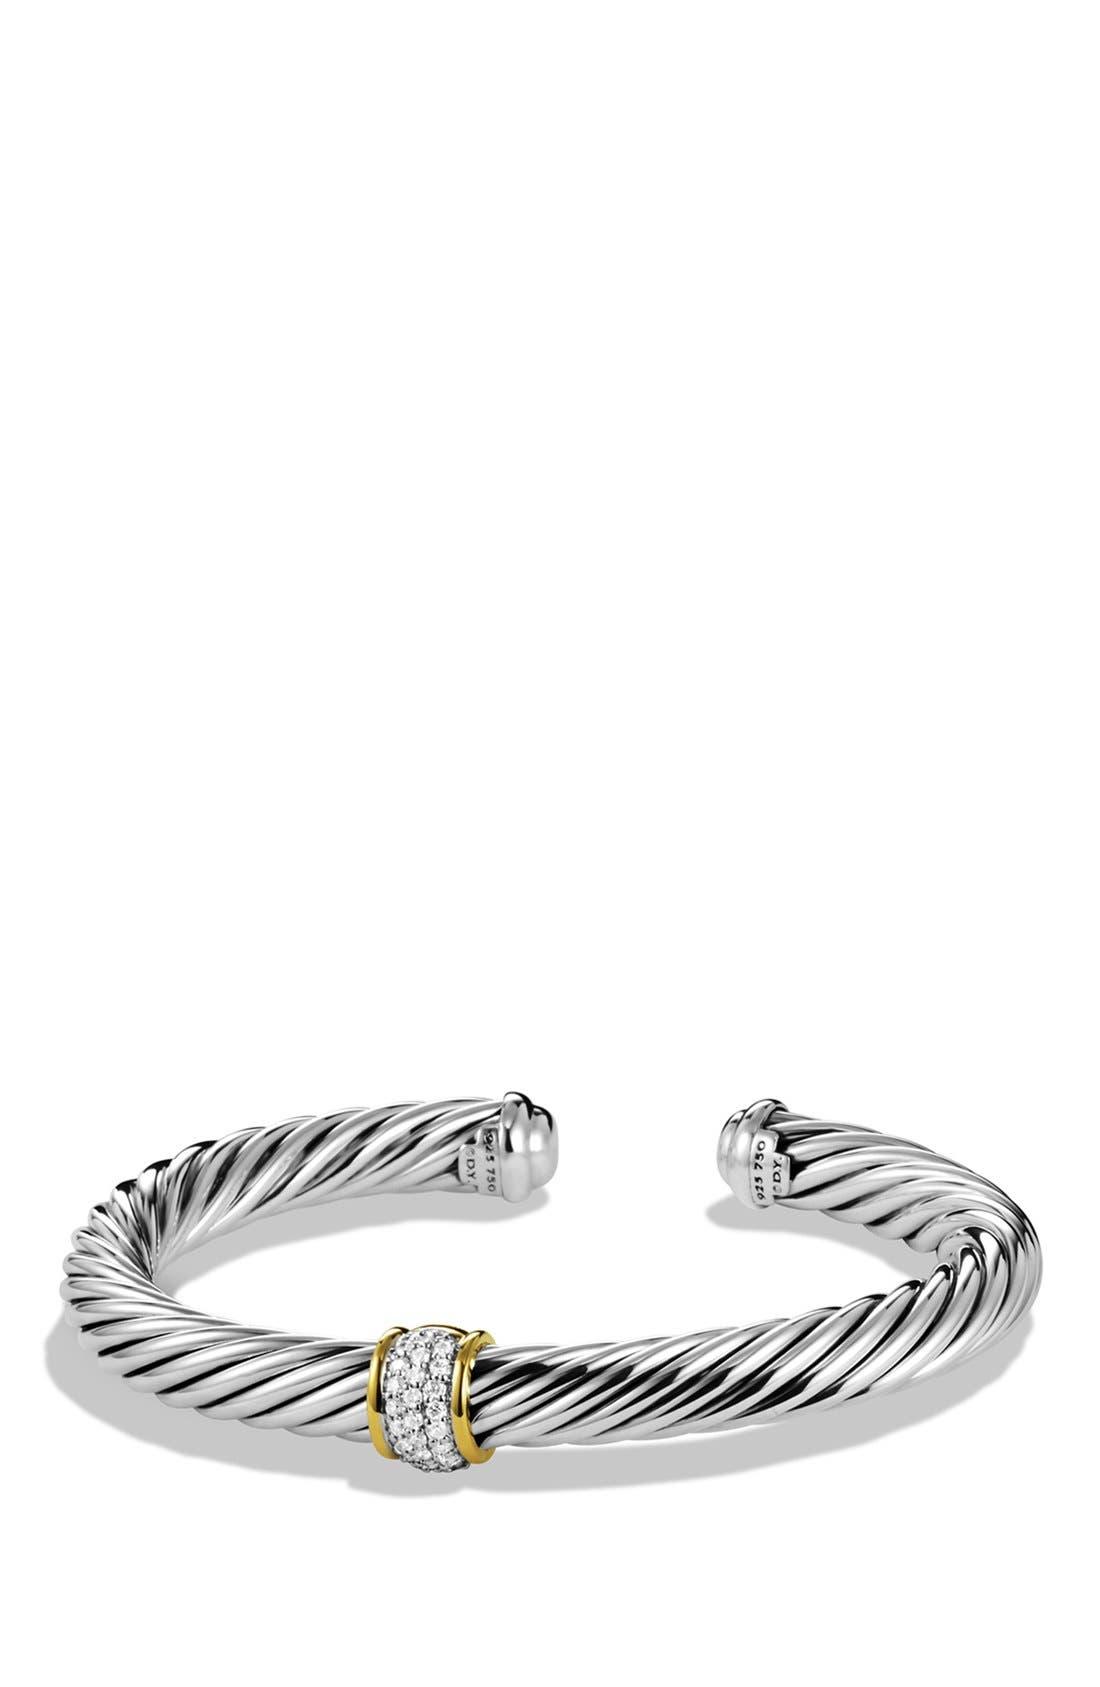 Cable Classics Bracelet with Diamonds & 18K Gold, 7mm,                         Main,                         color, Diamond